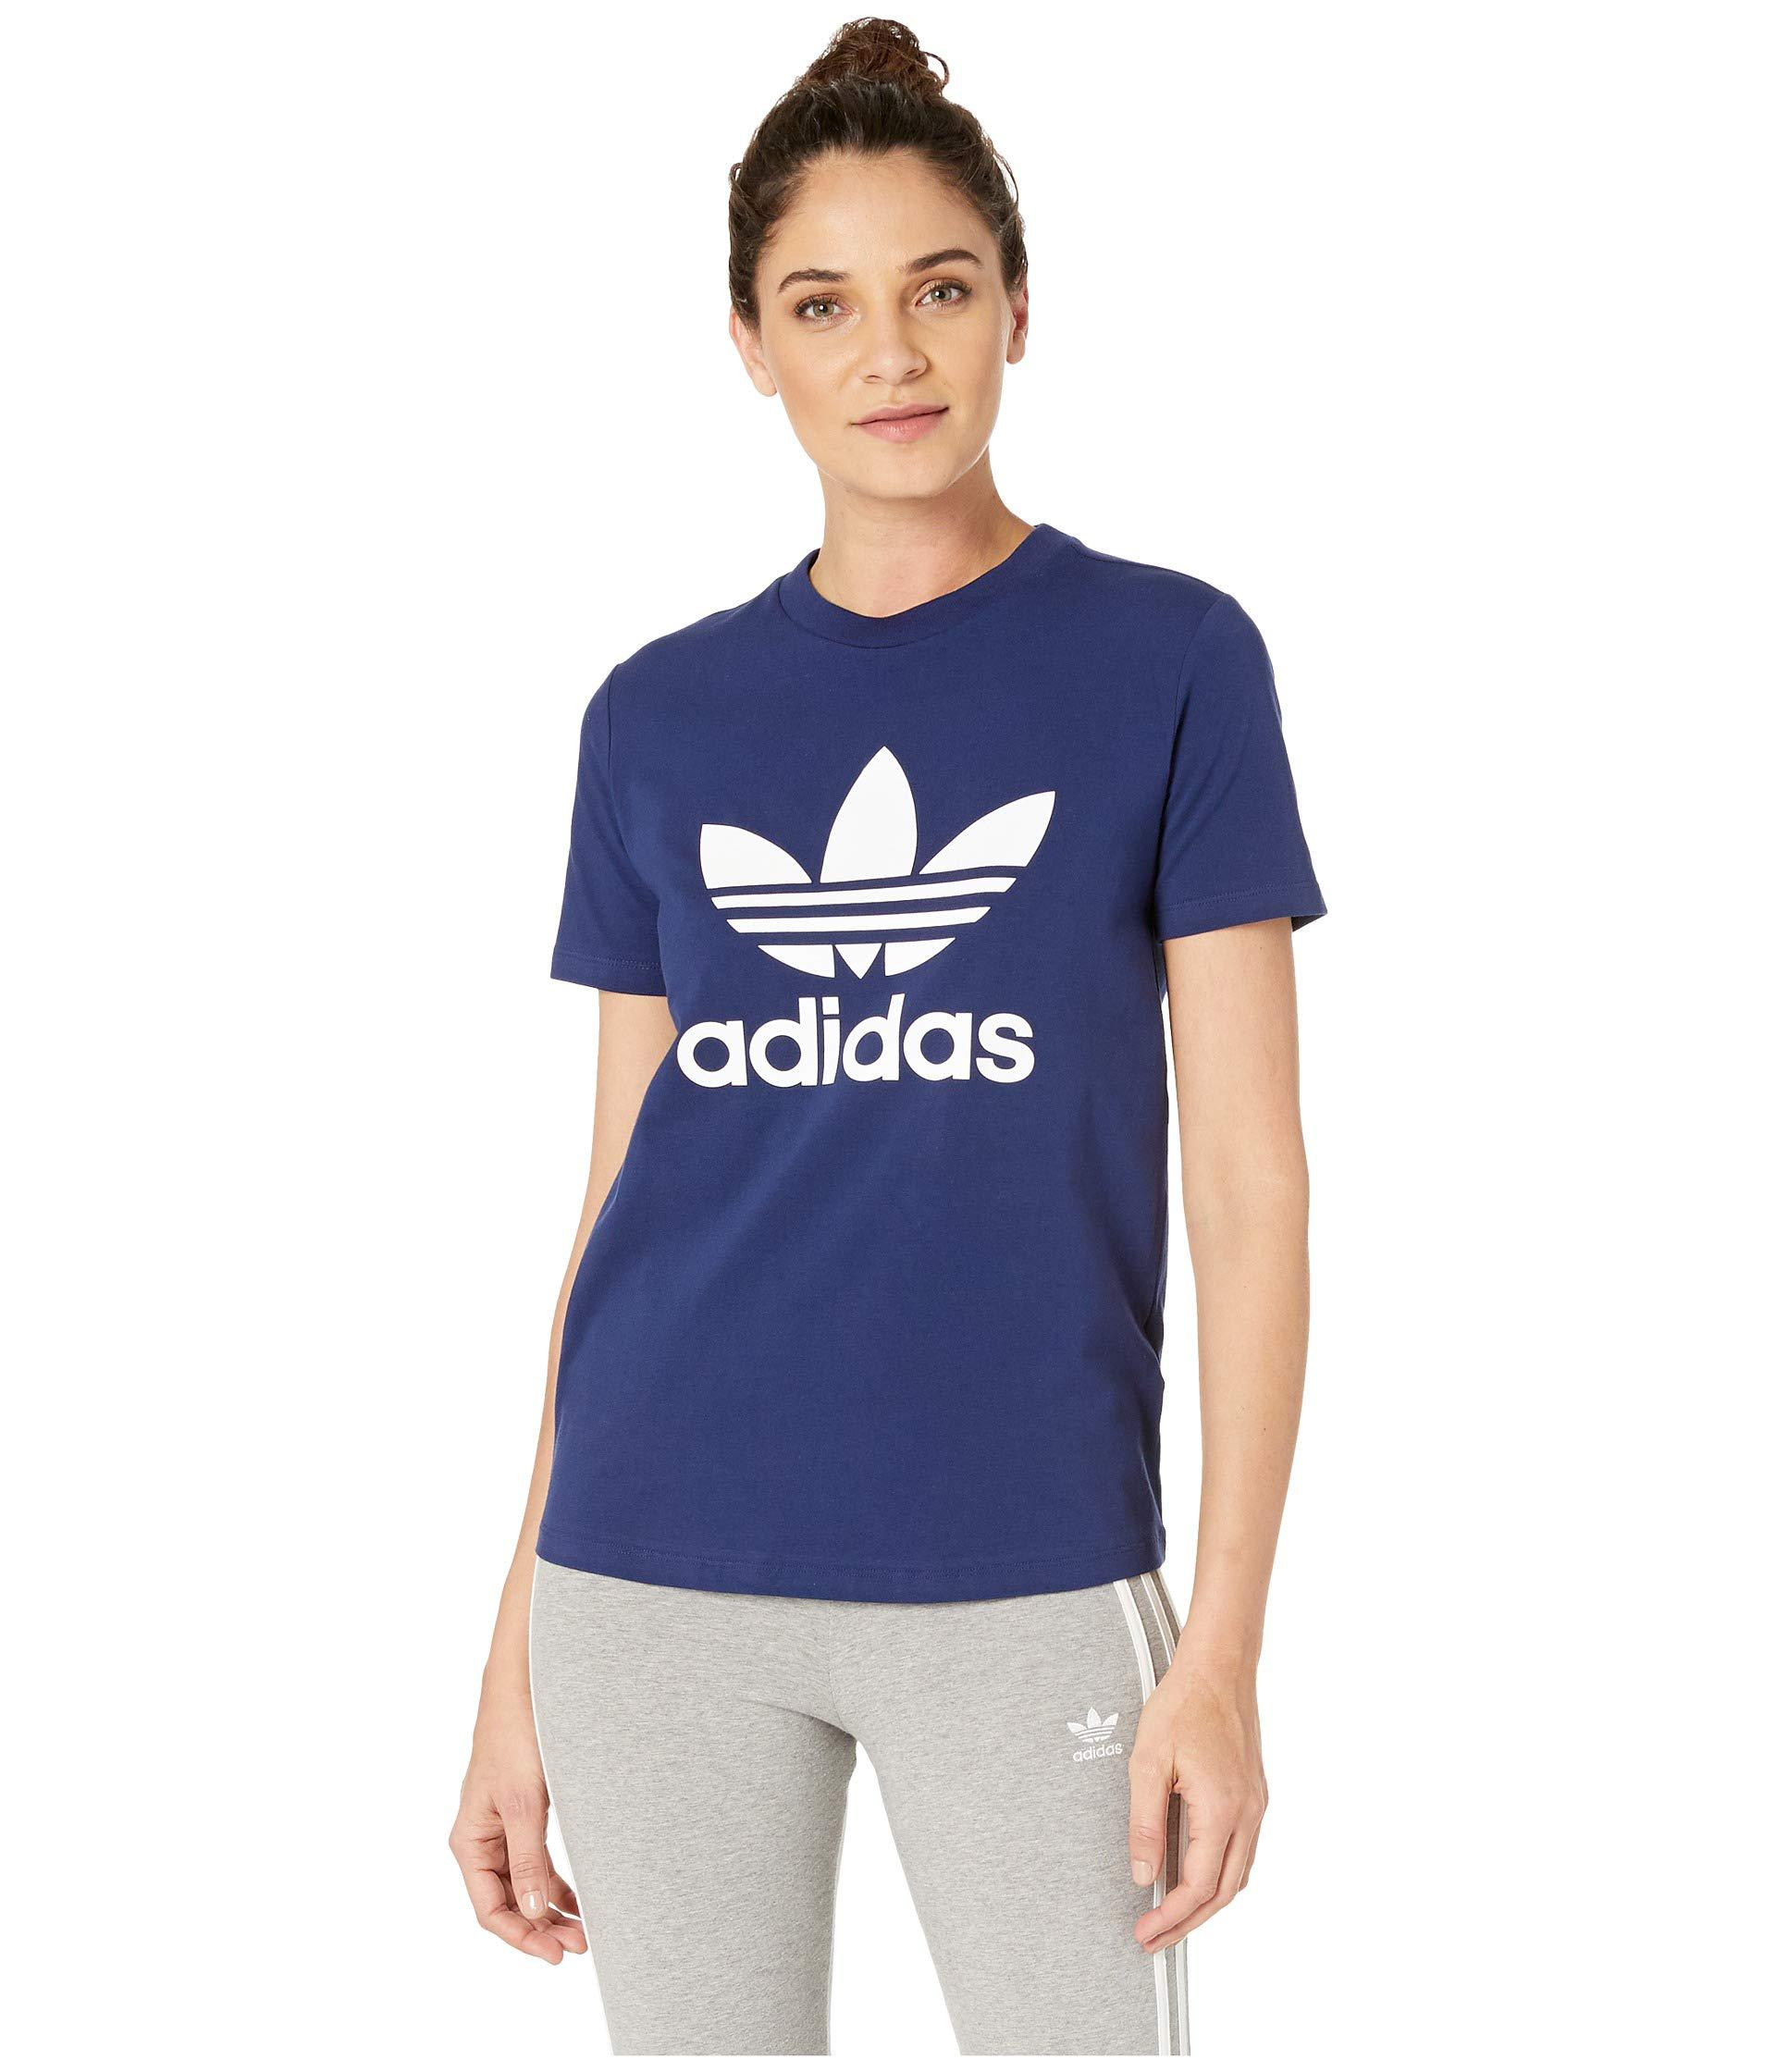 1dd63732fe6 Adidas Trefoil 3 Stripes T Shirt In Sky Blue – EDGE Engineering and ...